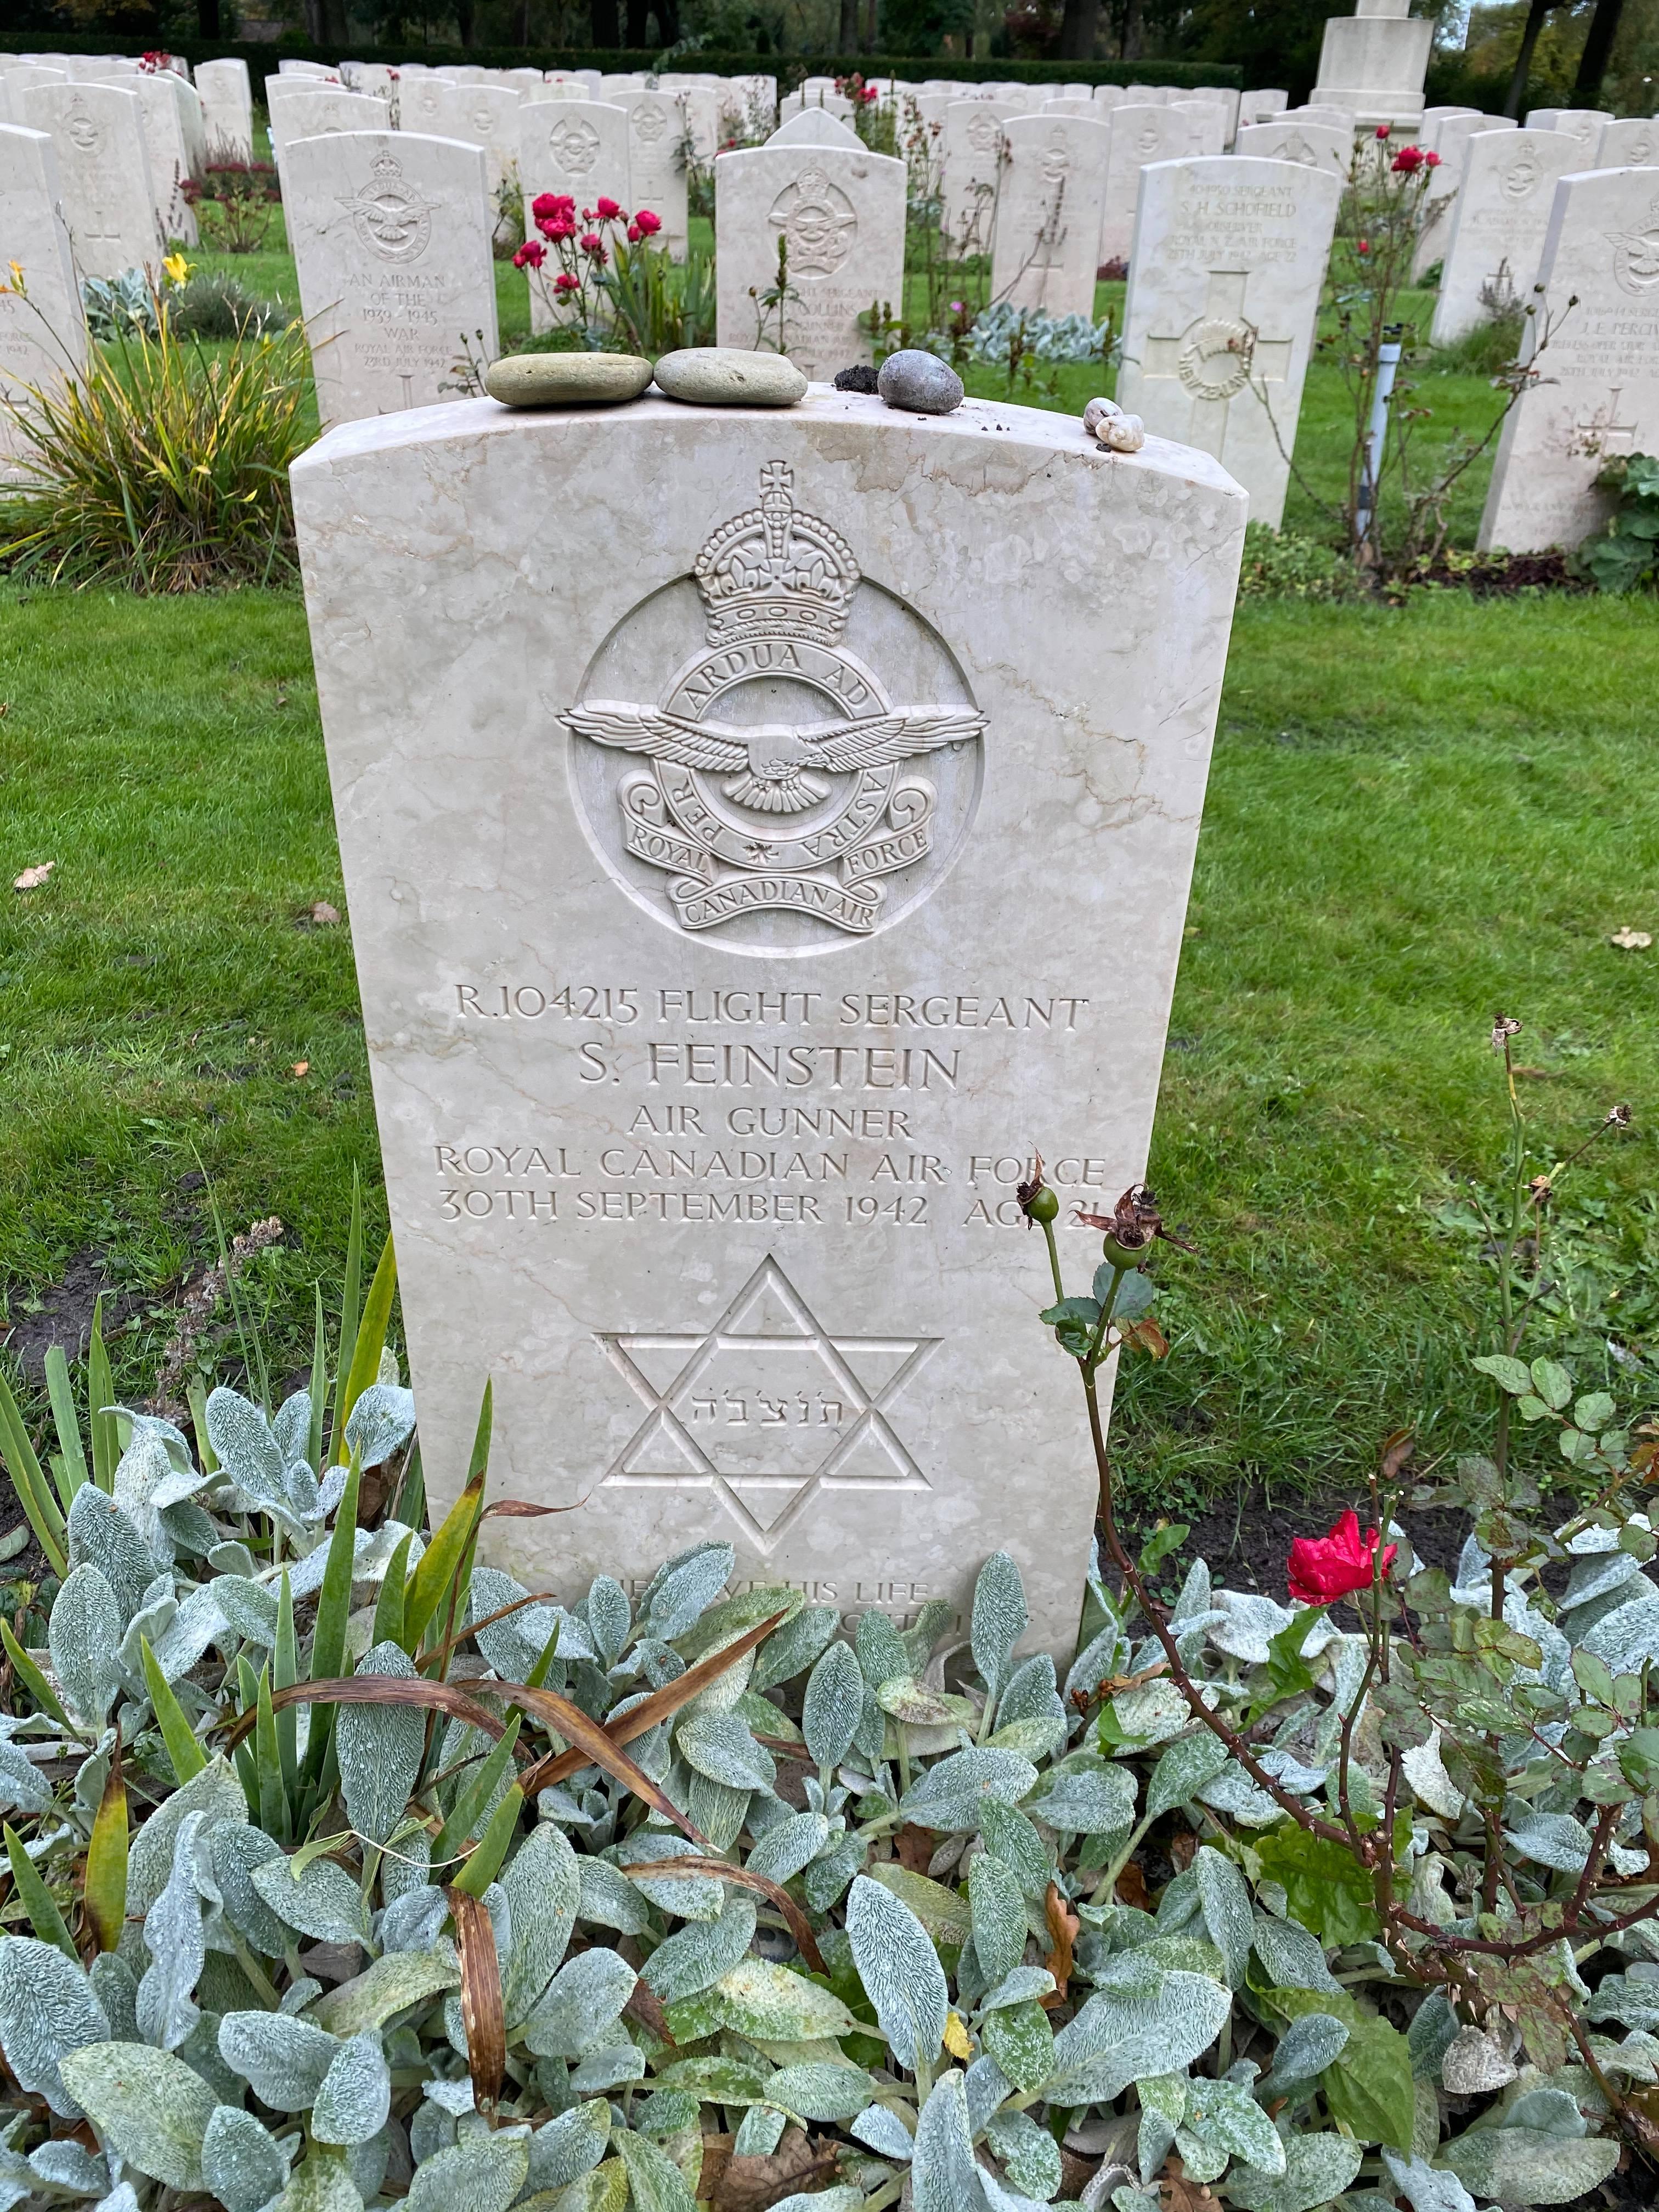 Grave marker– Grave marker from Sam Feinstein´s grave at Bergen General Cemetery, The Netherlands.